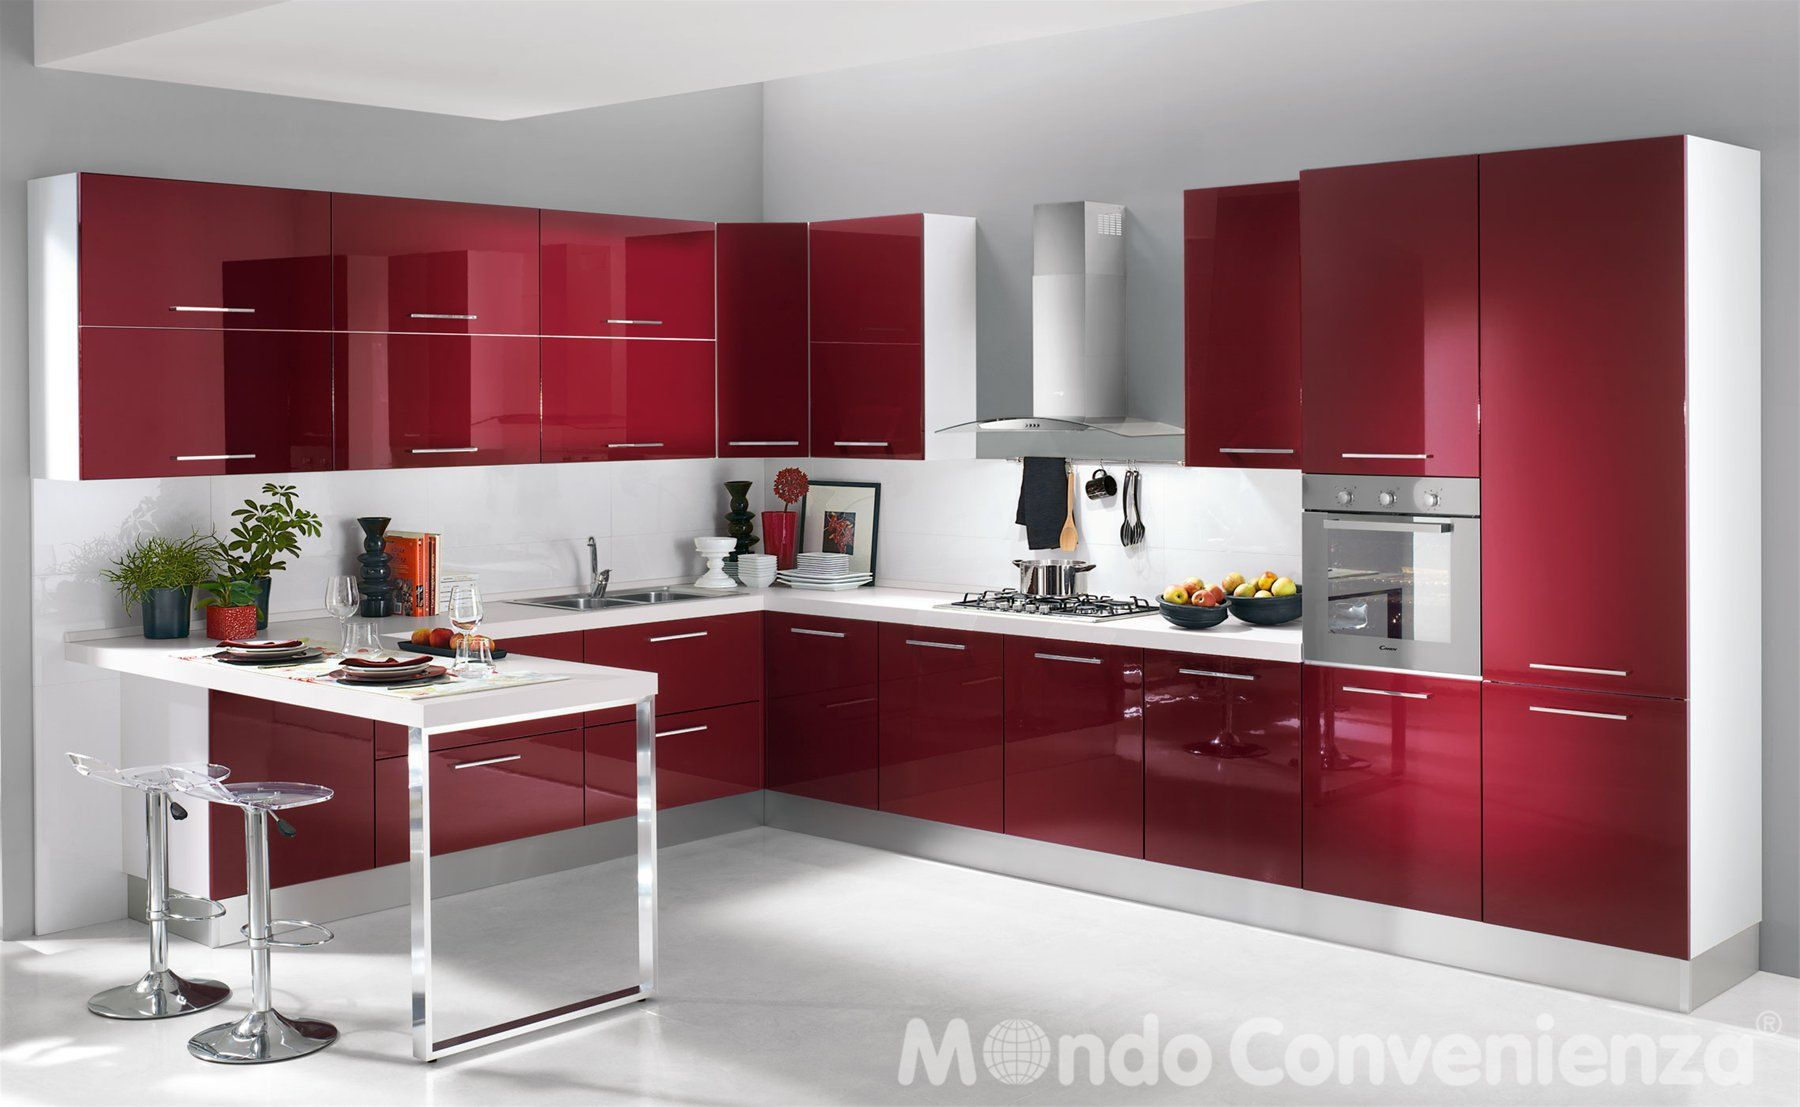 Cucina Katy - Mondo Convenienza · Katy € 1.295 | 倫 倫 倫 Ꮇყ sωɛɛƗ ...